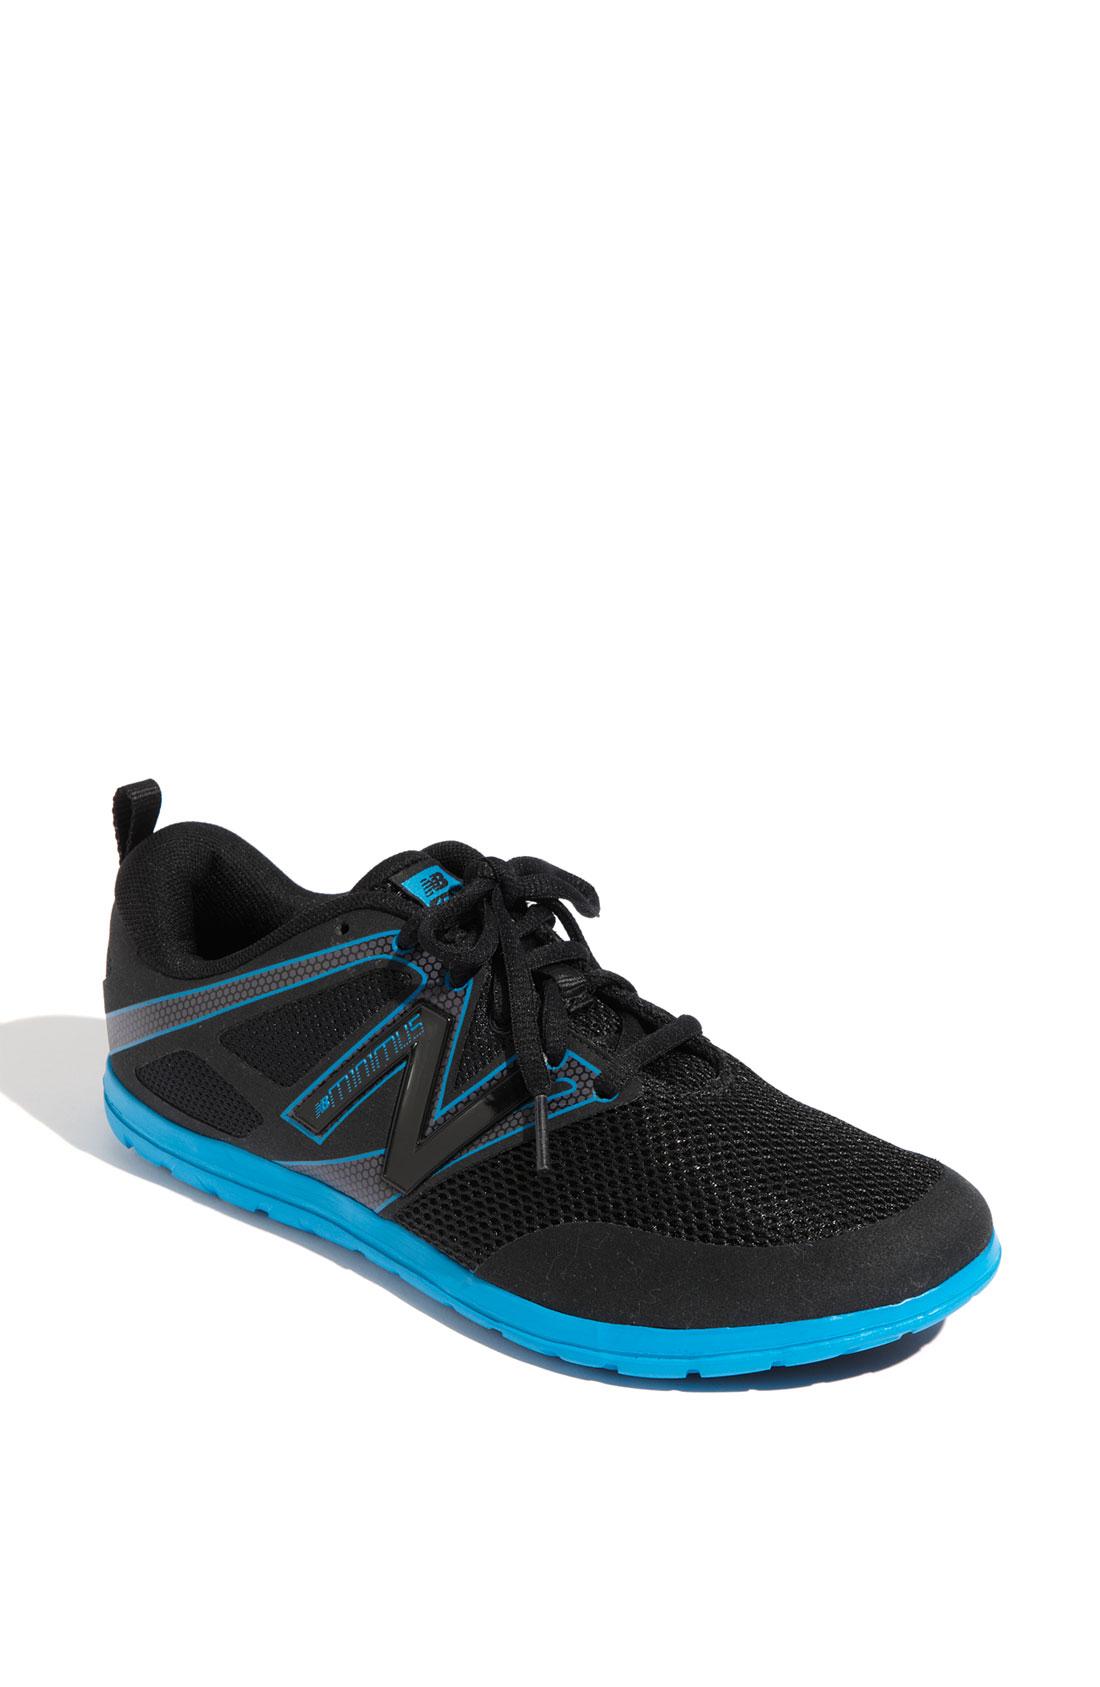 Womens New Balance Mesh Training Shoe W